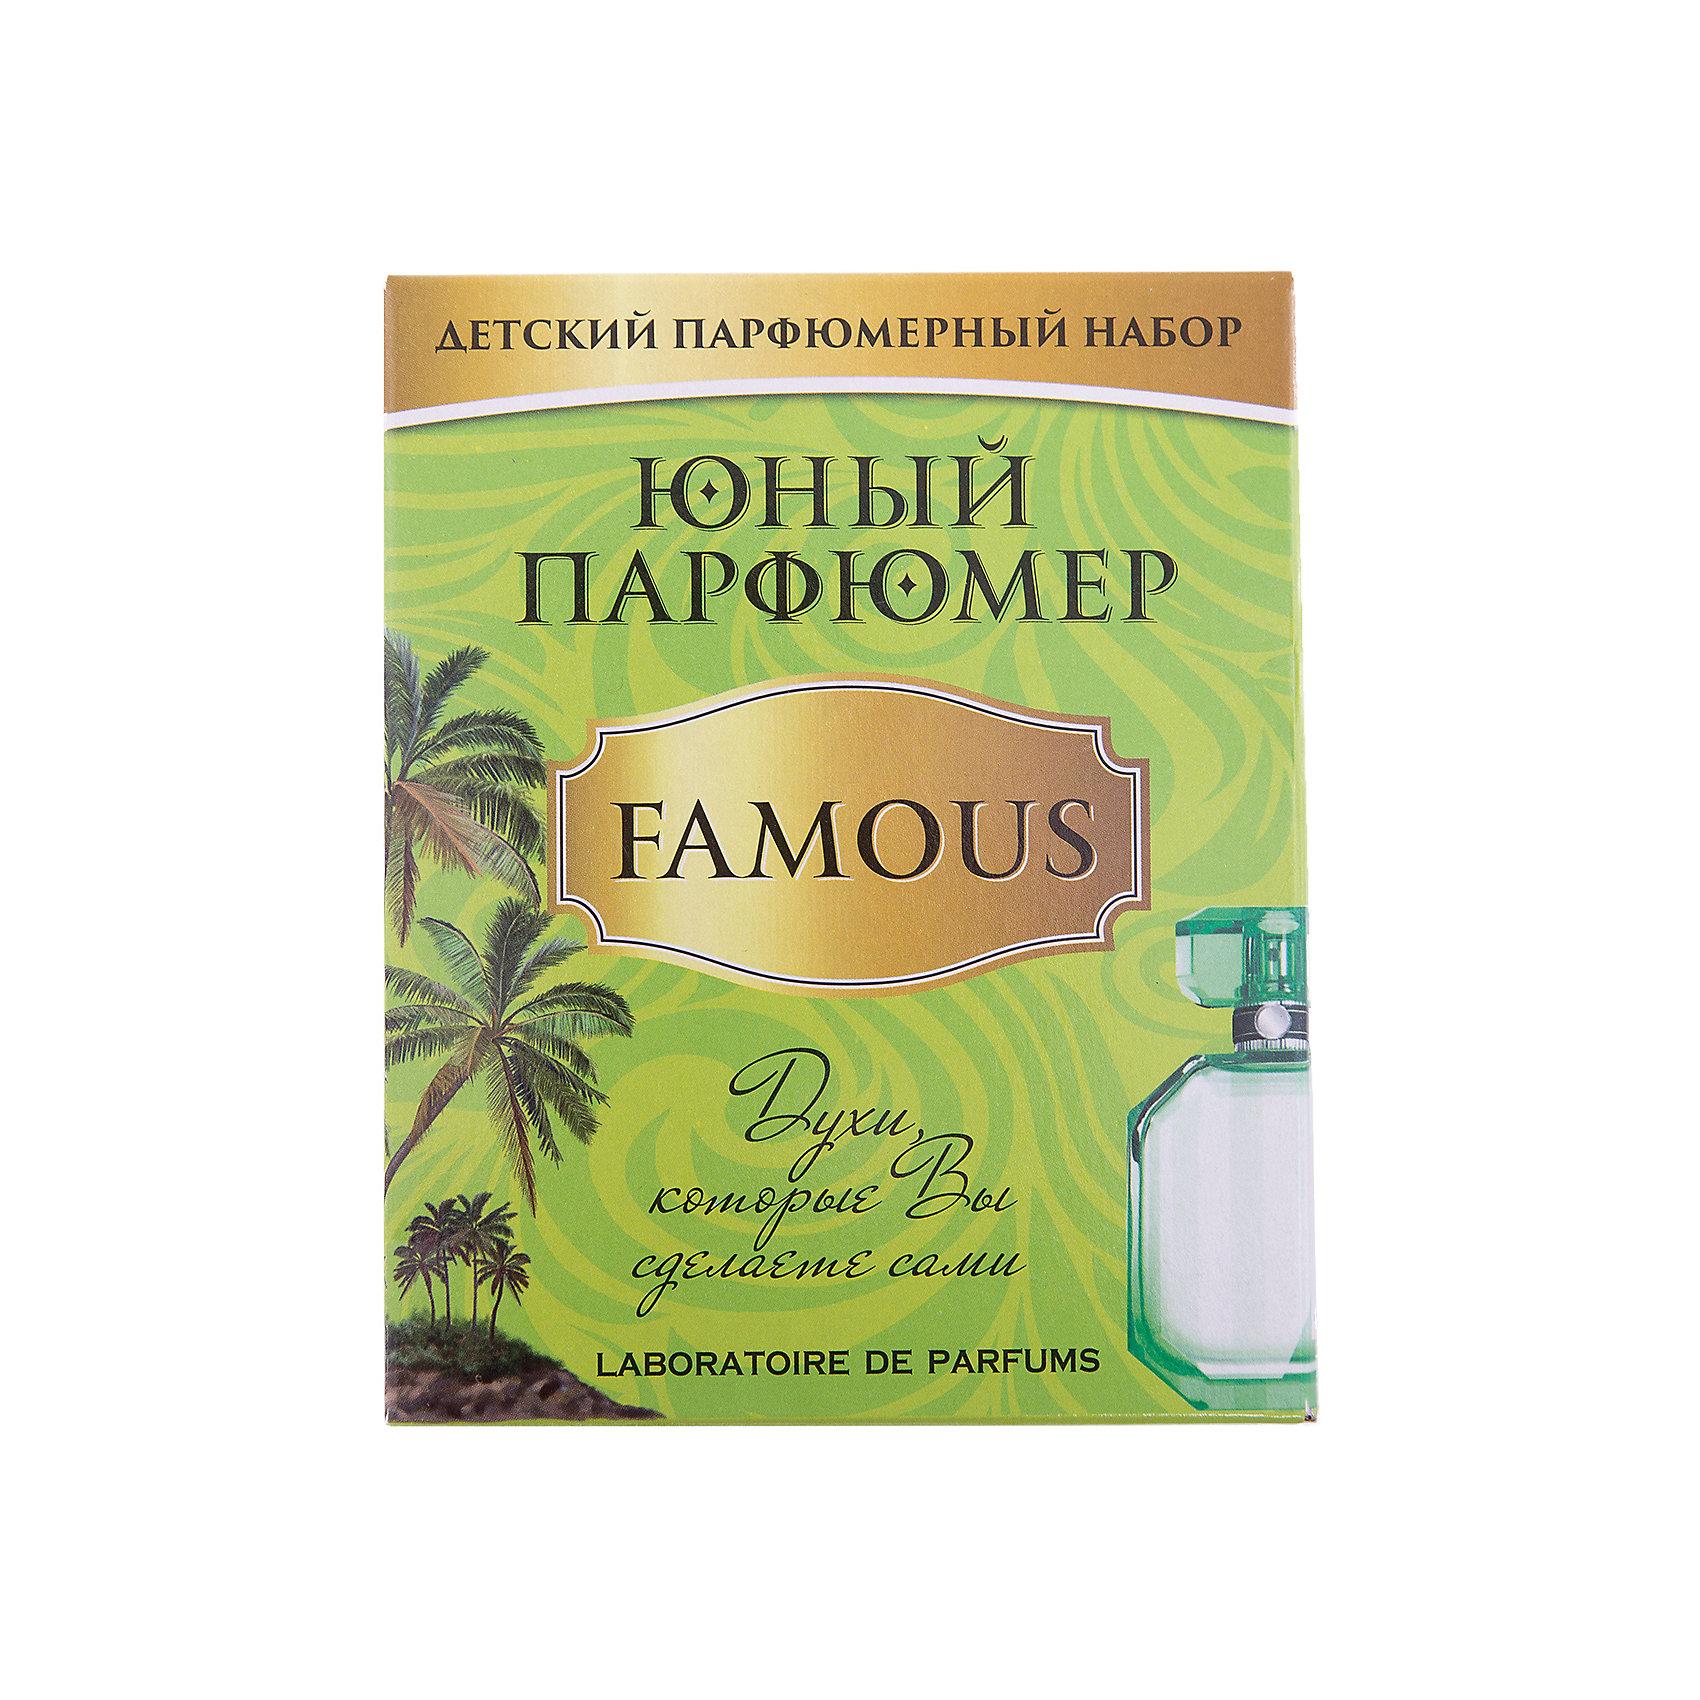 Каррас Набор Юный Парфюмер (мини) FAMOUS каррас каррас набор юный парфюмер цветочные ароматы